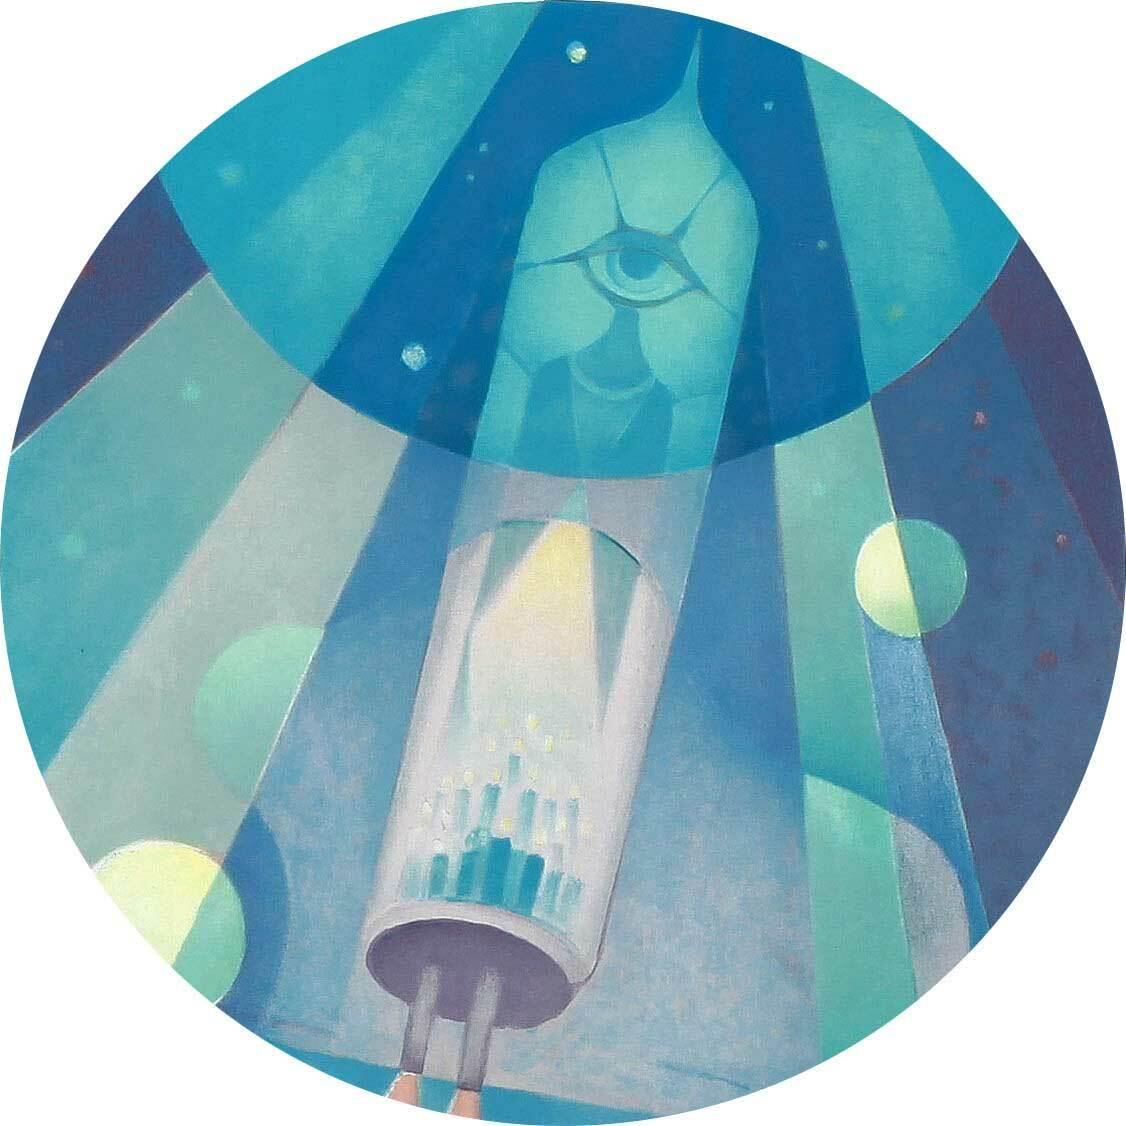 Genius of Time – Kepler 186f (Ainara Sweden)